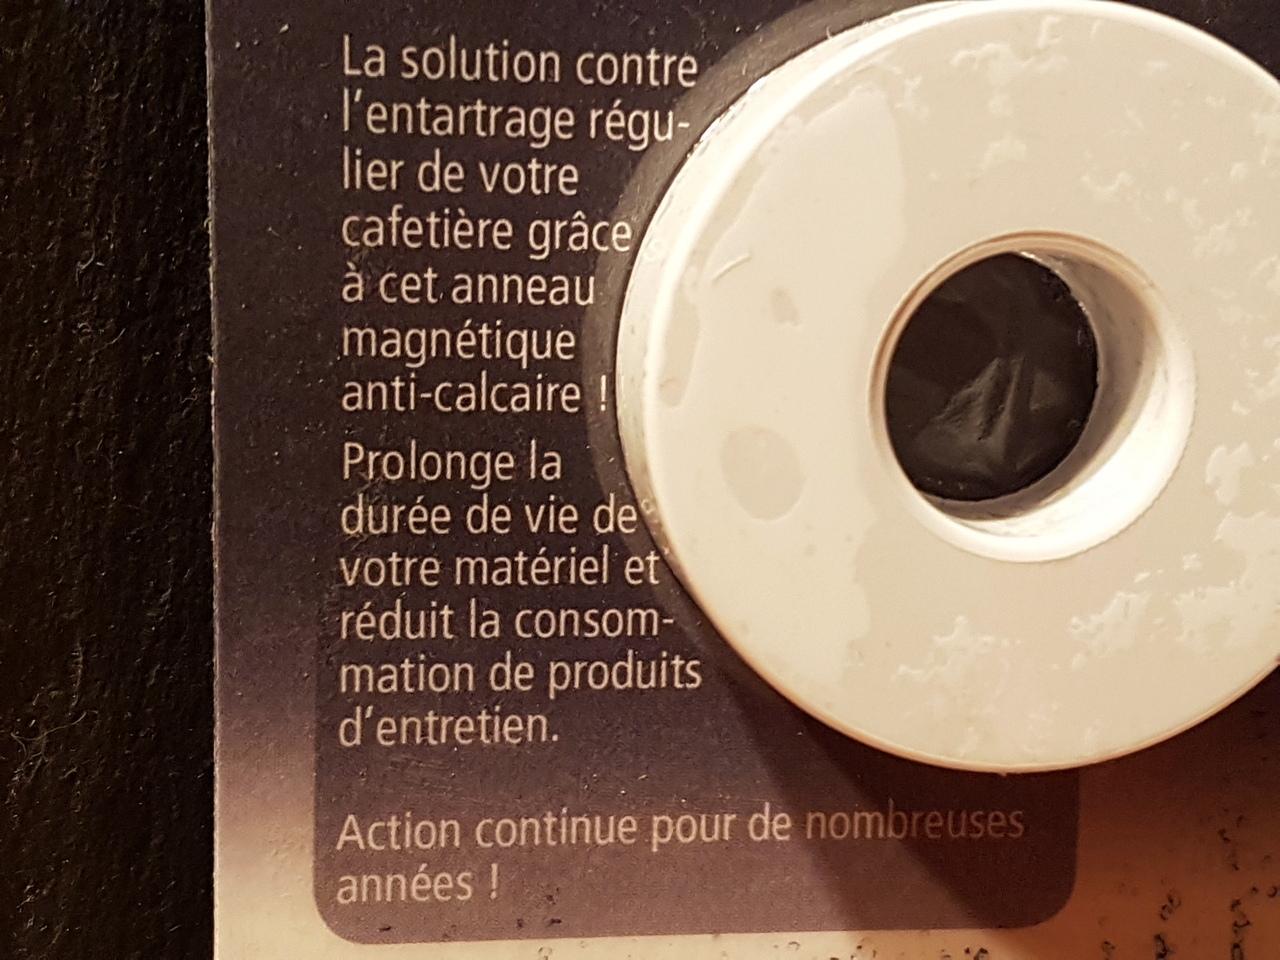 Anneau anti calcaire machine a cafe 2